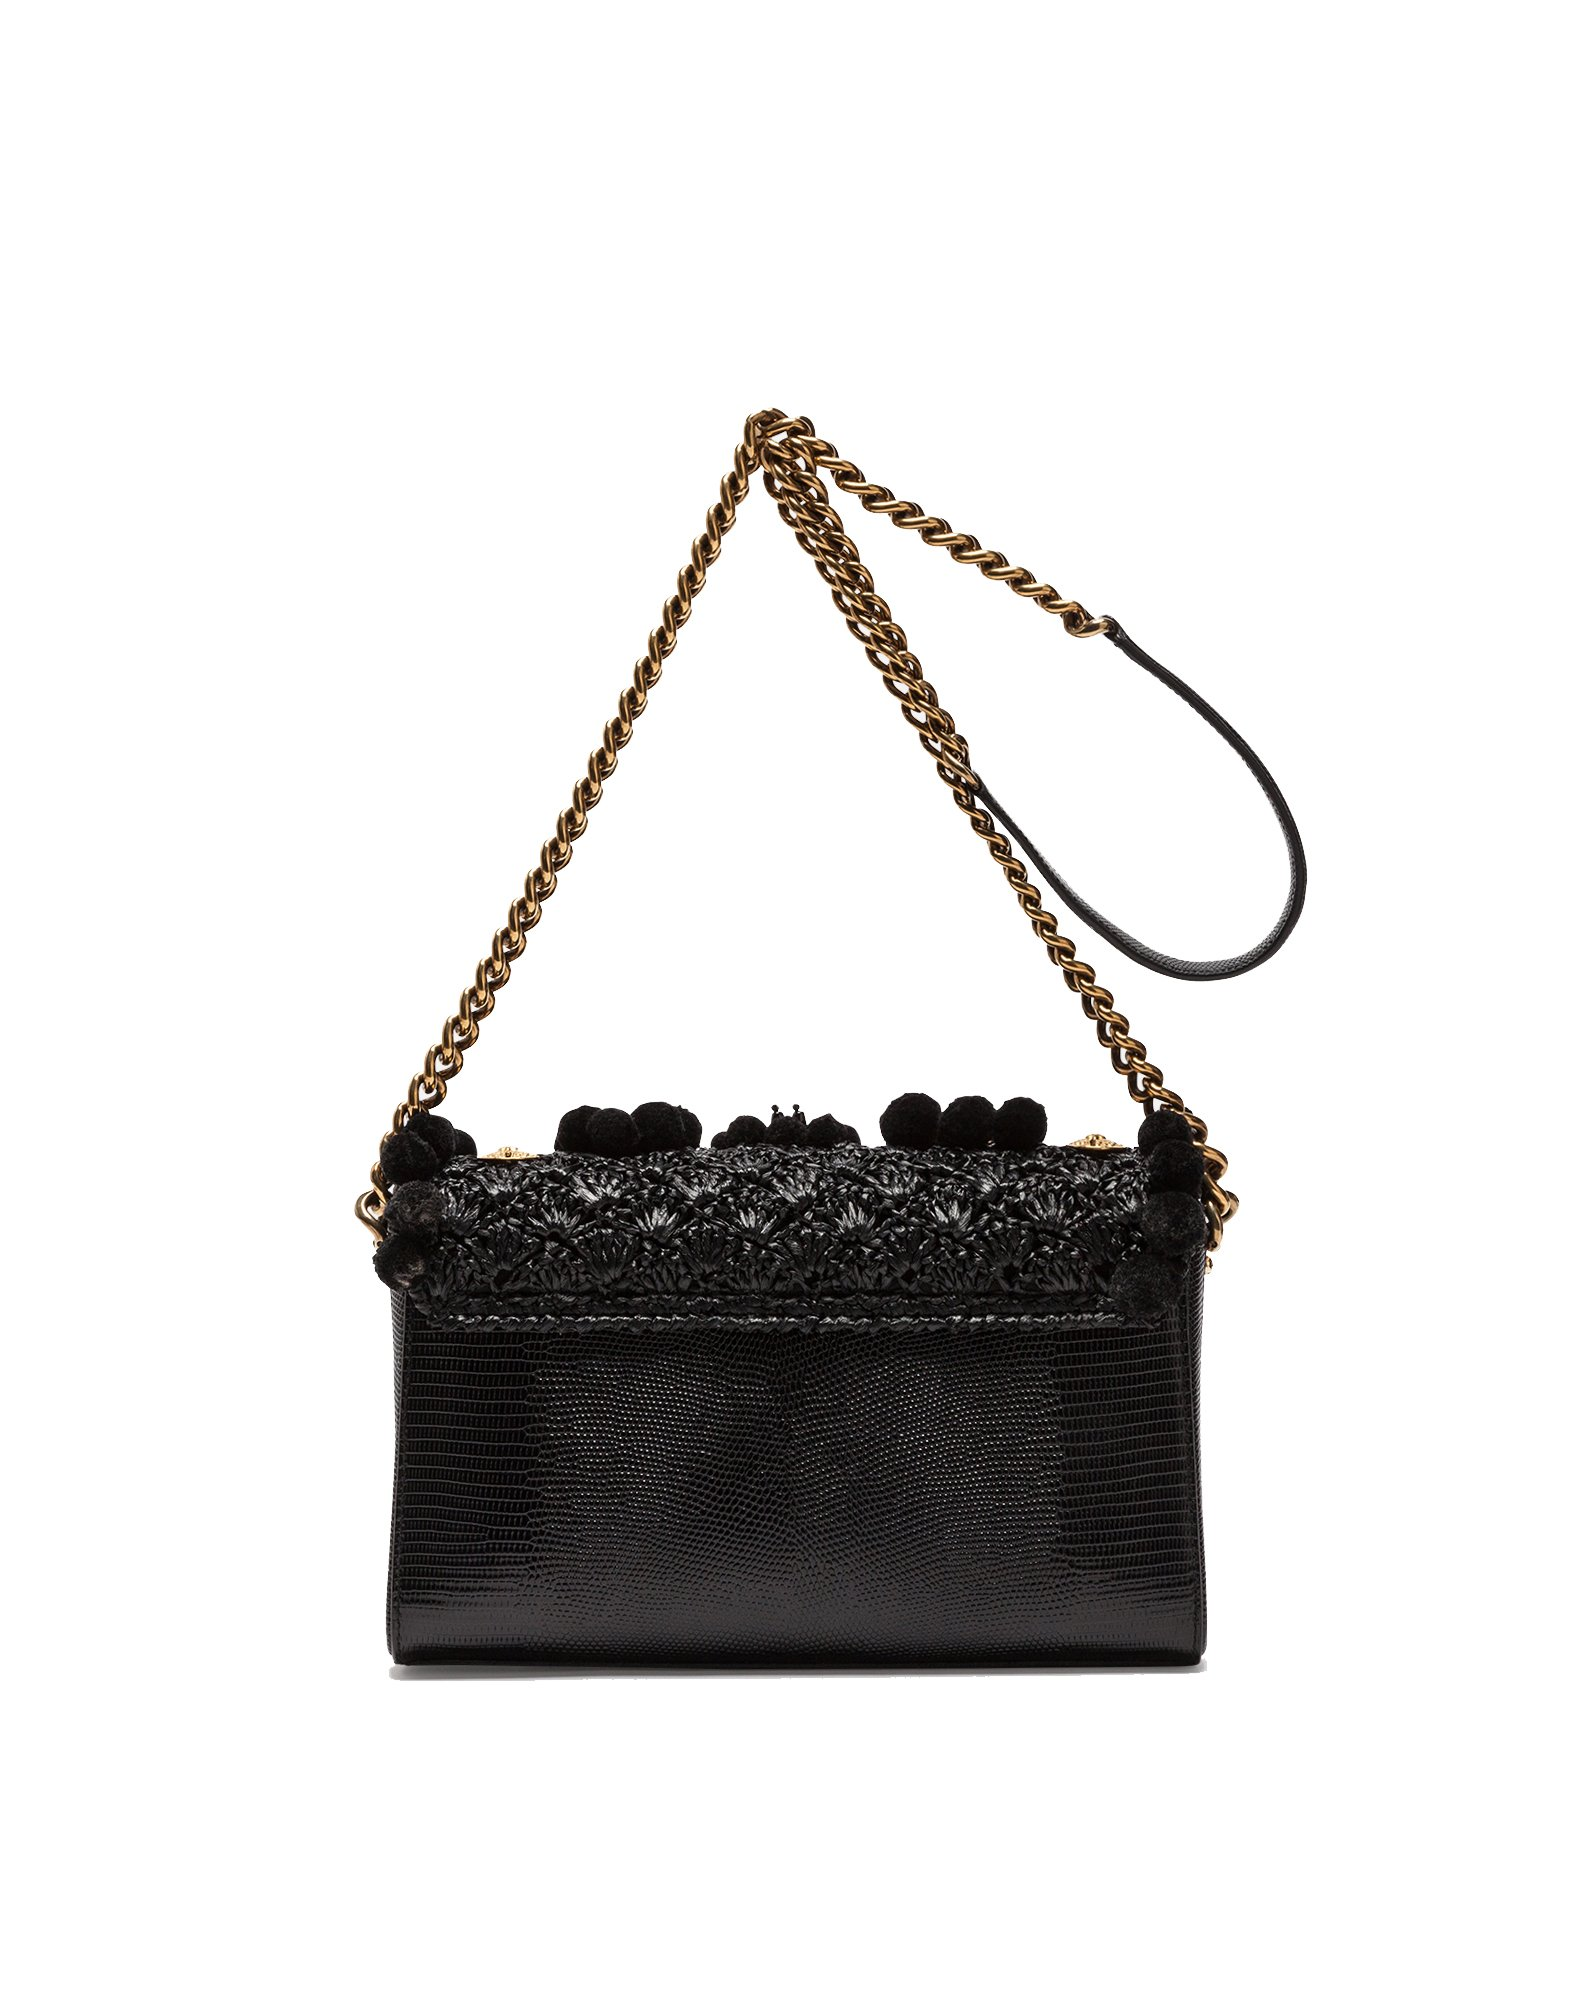 Dolce E Gabbana Women's Bb6393as9038b956 Black Leather Shoulder Bag by Dolce e Gabbana (Image #3)